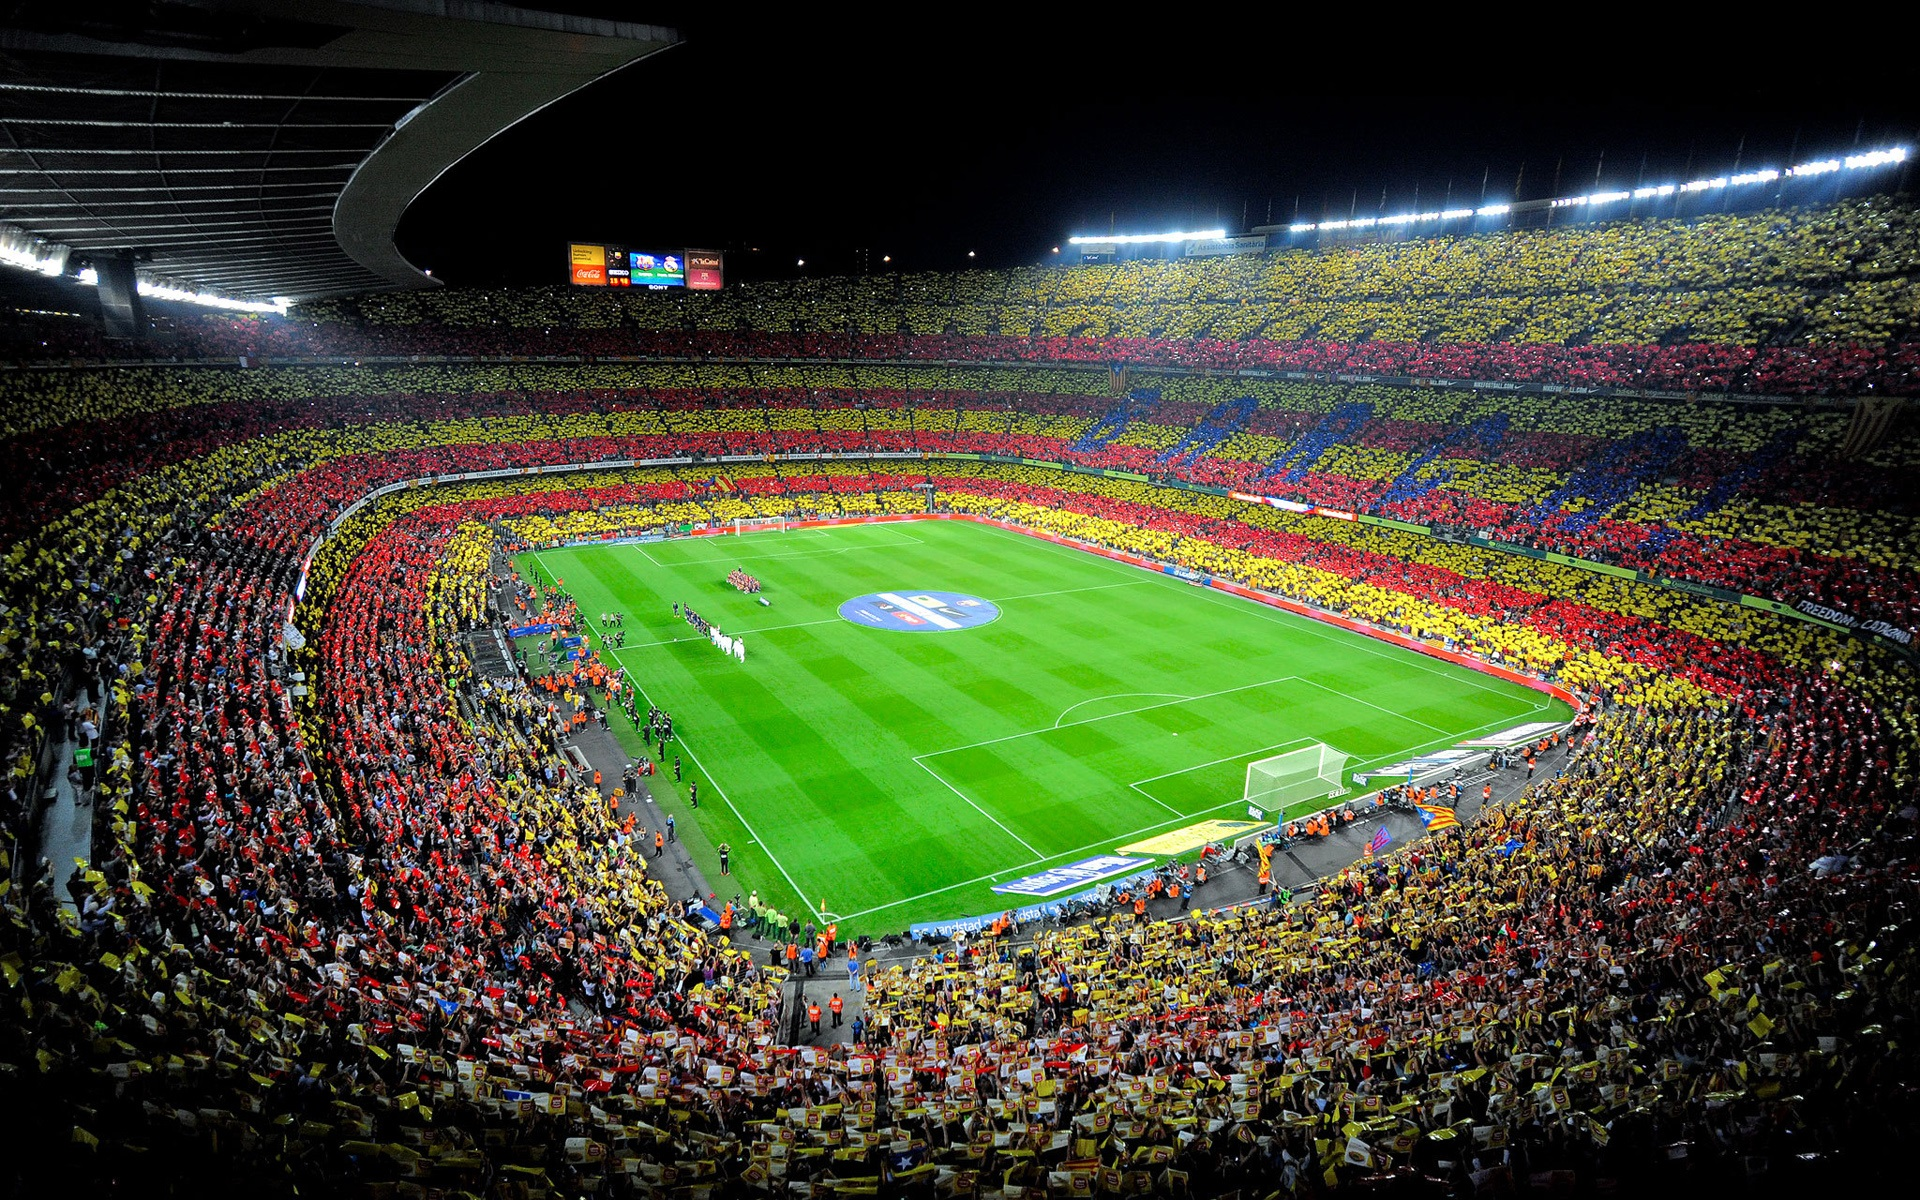 Fondos De Pantalla Camp Nou España El Fc Barcelona